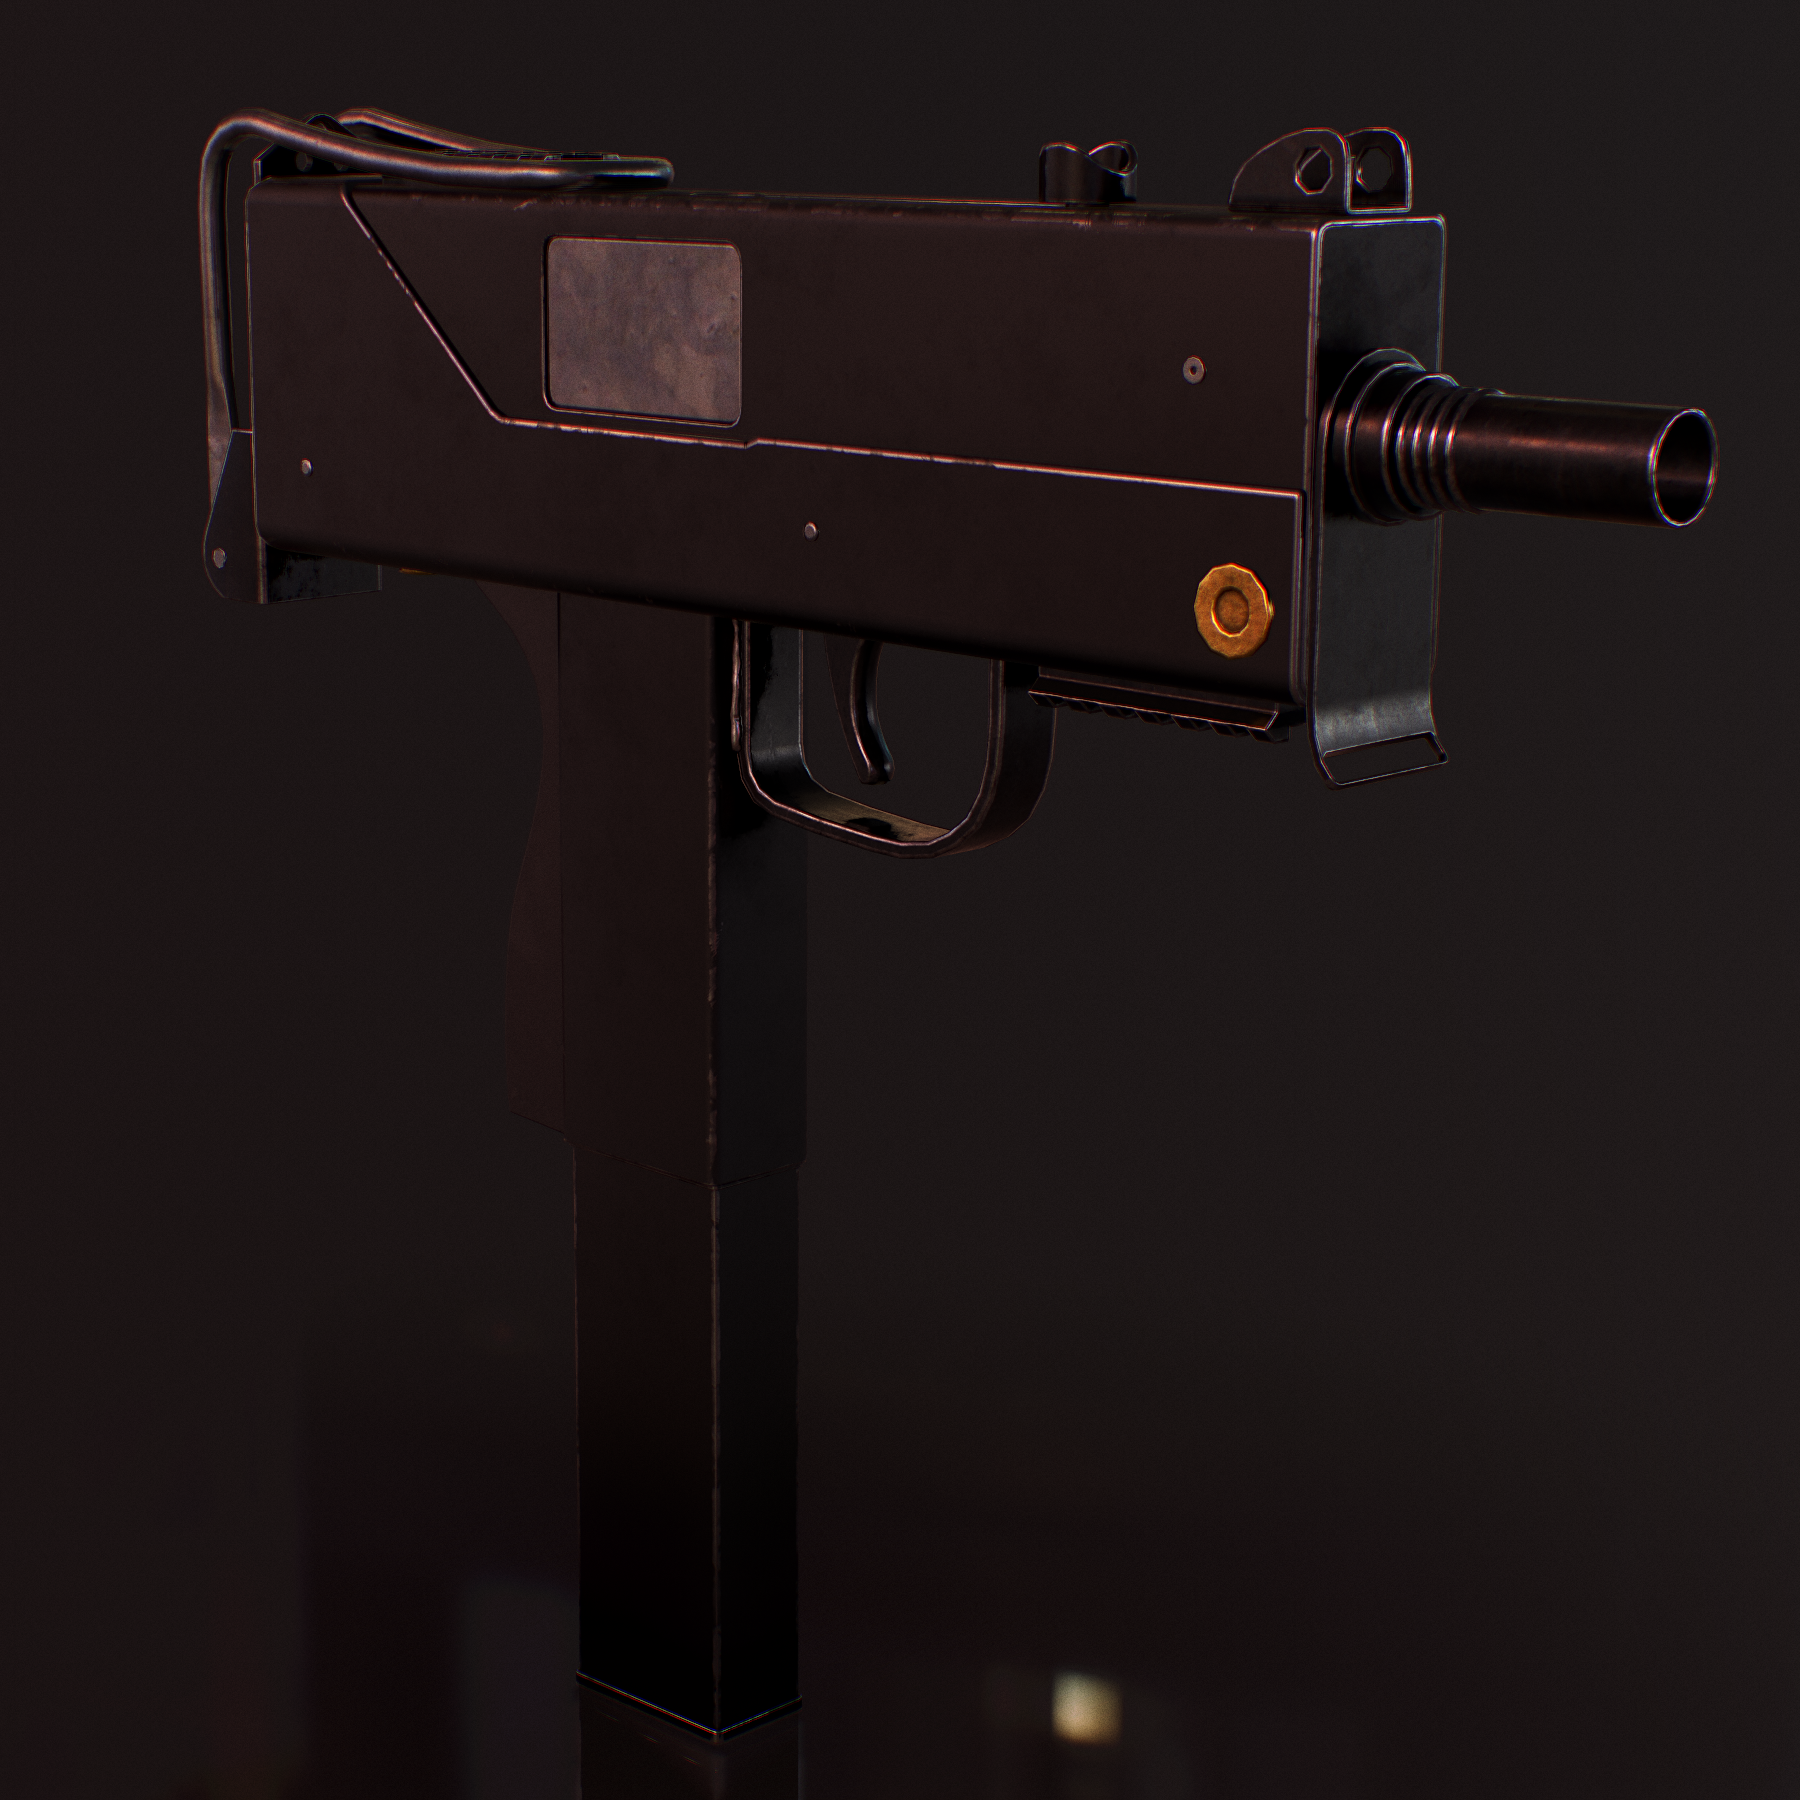 Mac 10 Sub-machine Gun